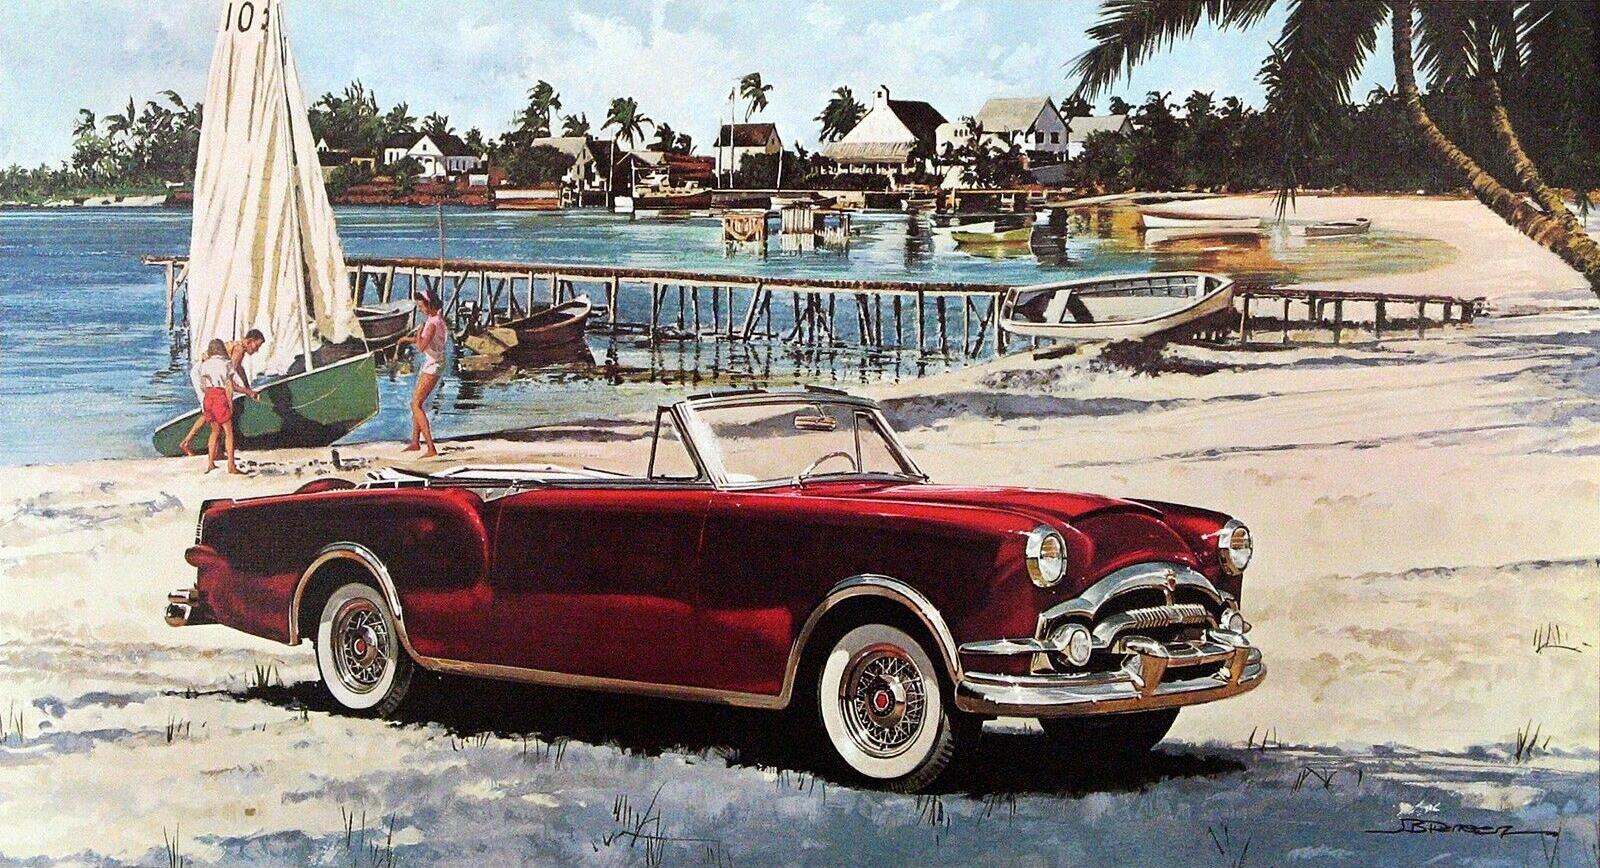 1953. Packard Caribbean. Illustrated by James B. Deneen